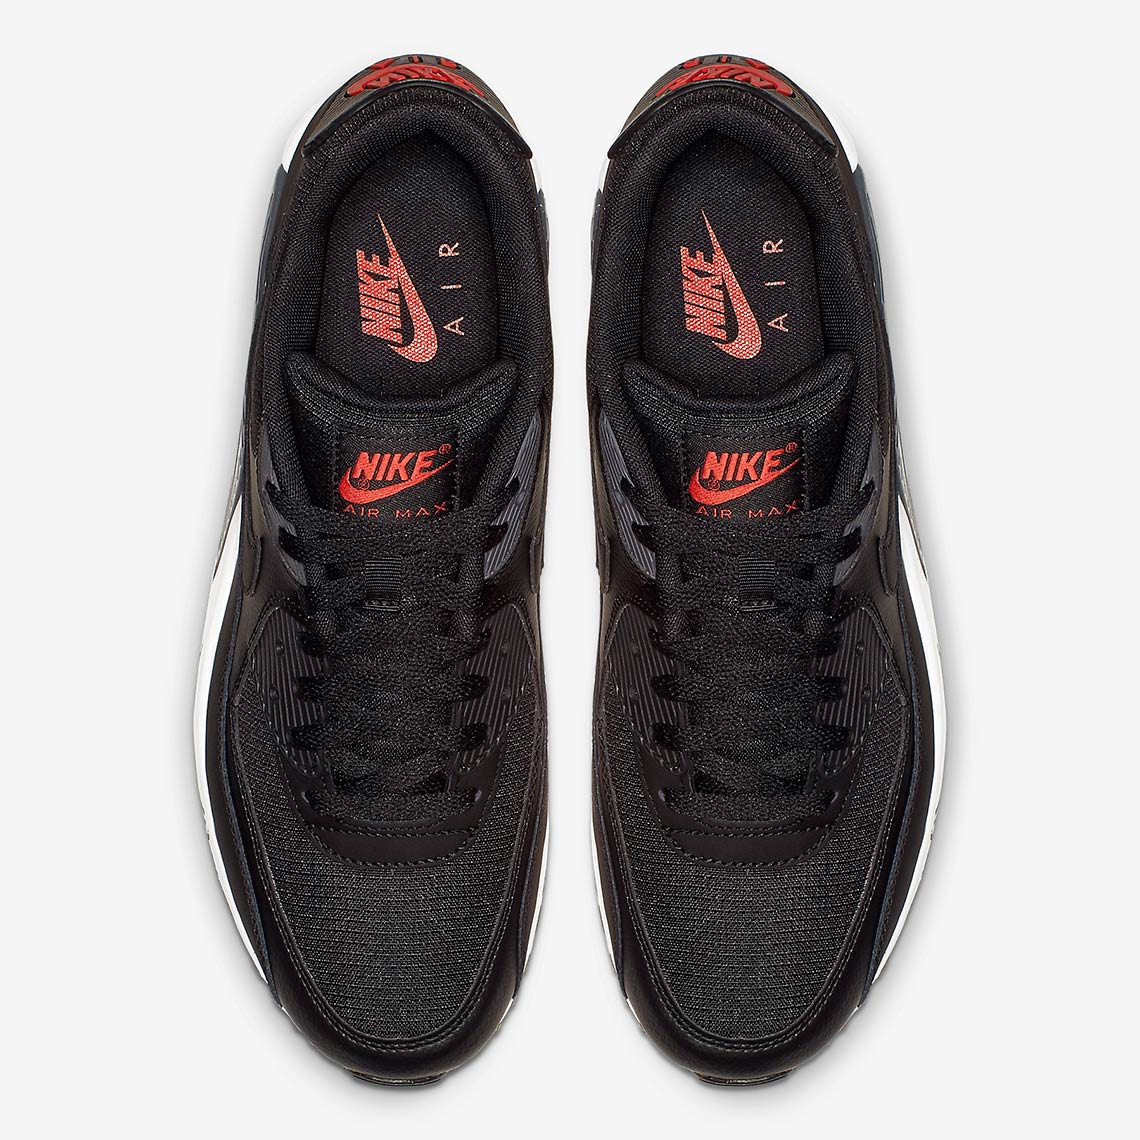 321cf6959b49c Nike Air Max 90 $110. Color: Black/Habanero Red-Black Style Code: CD1526-001